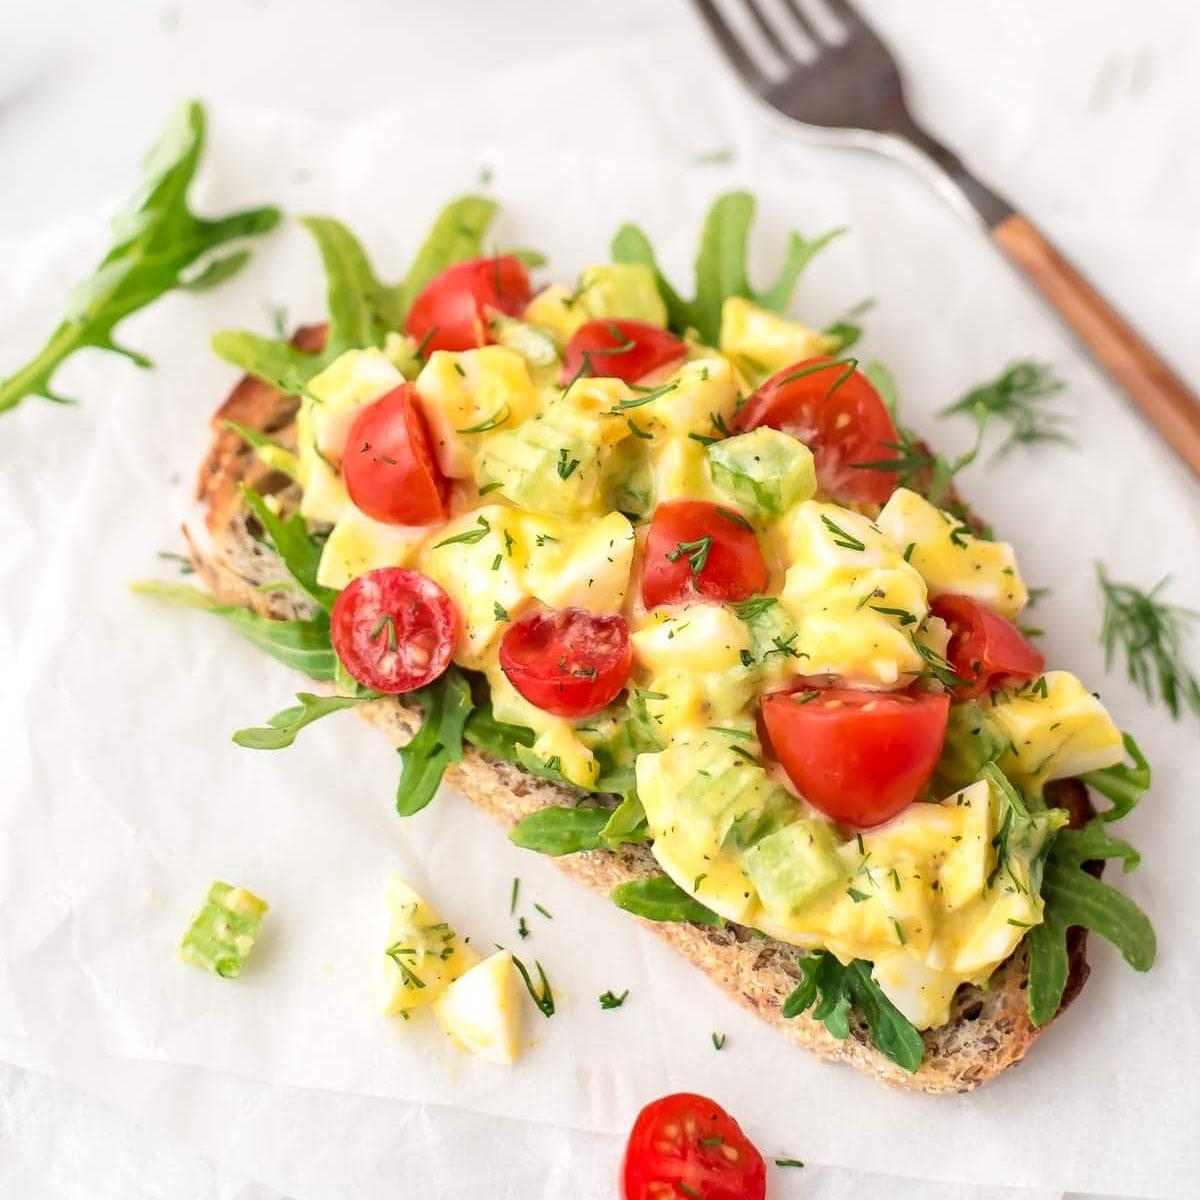 Healthy-Egg-Salad-recipe-with-no-mayo.jpg